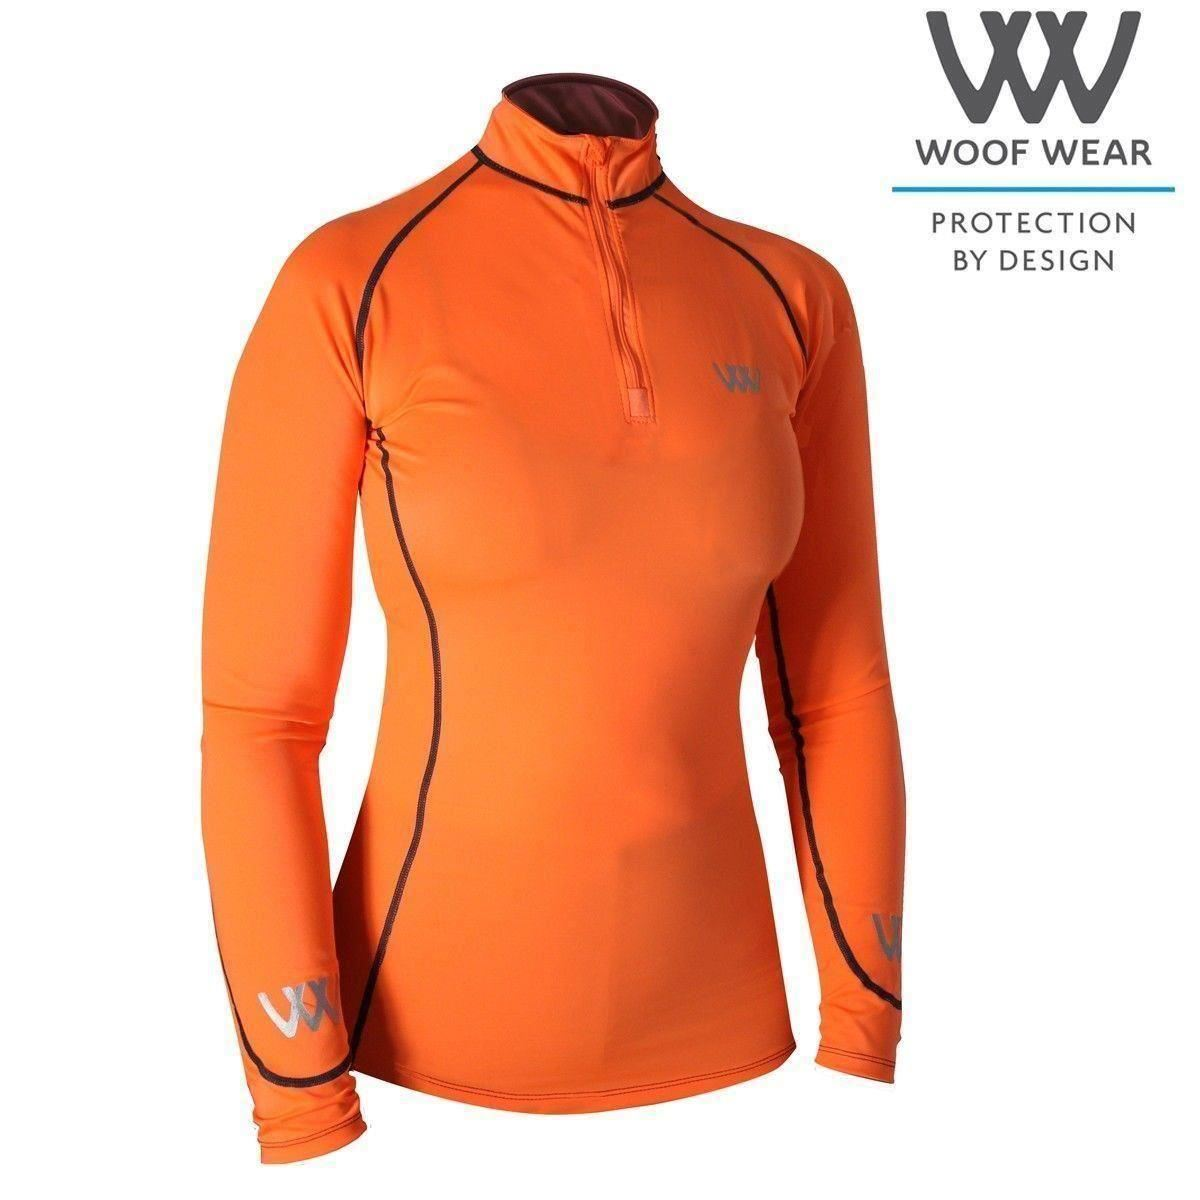 Woof Wear Performance Layer Riding Shirt Base Layer Performance 5828b0